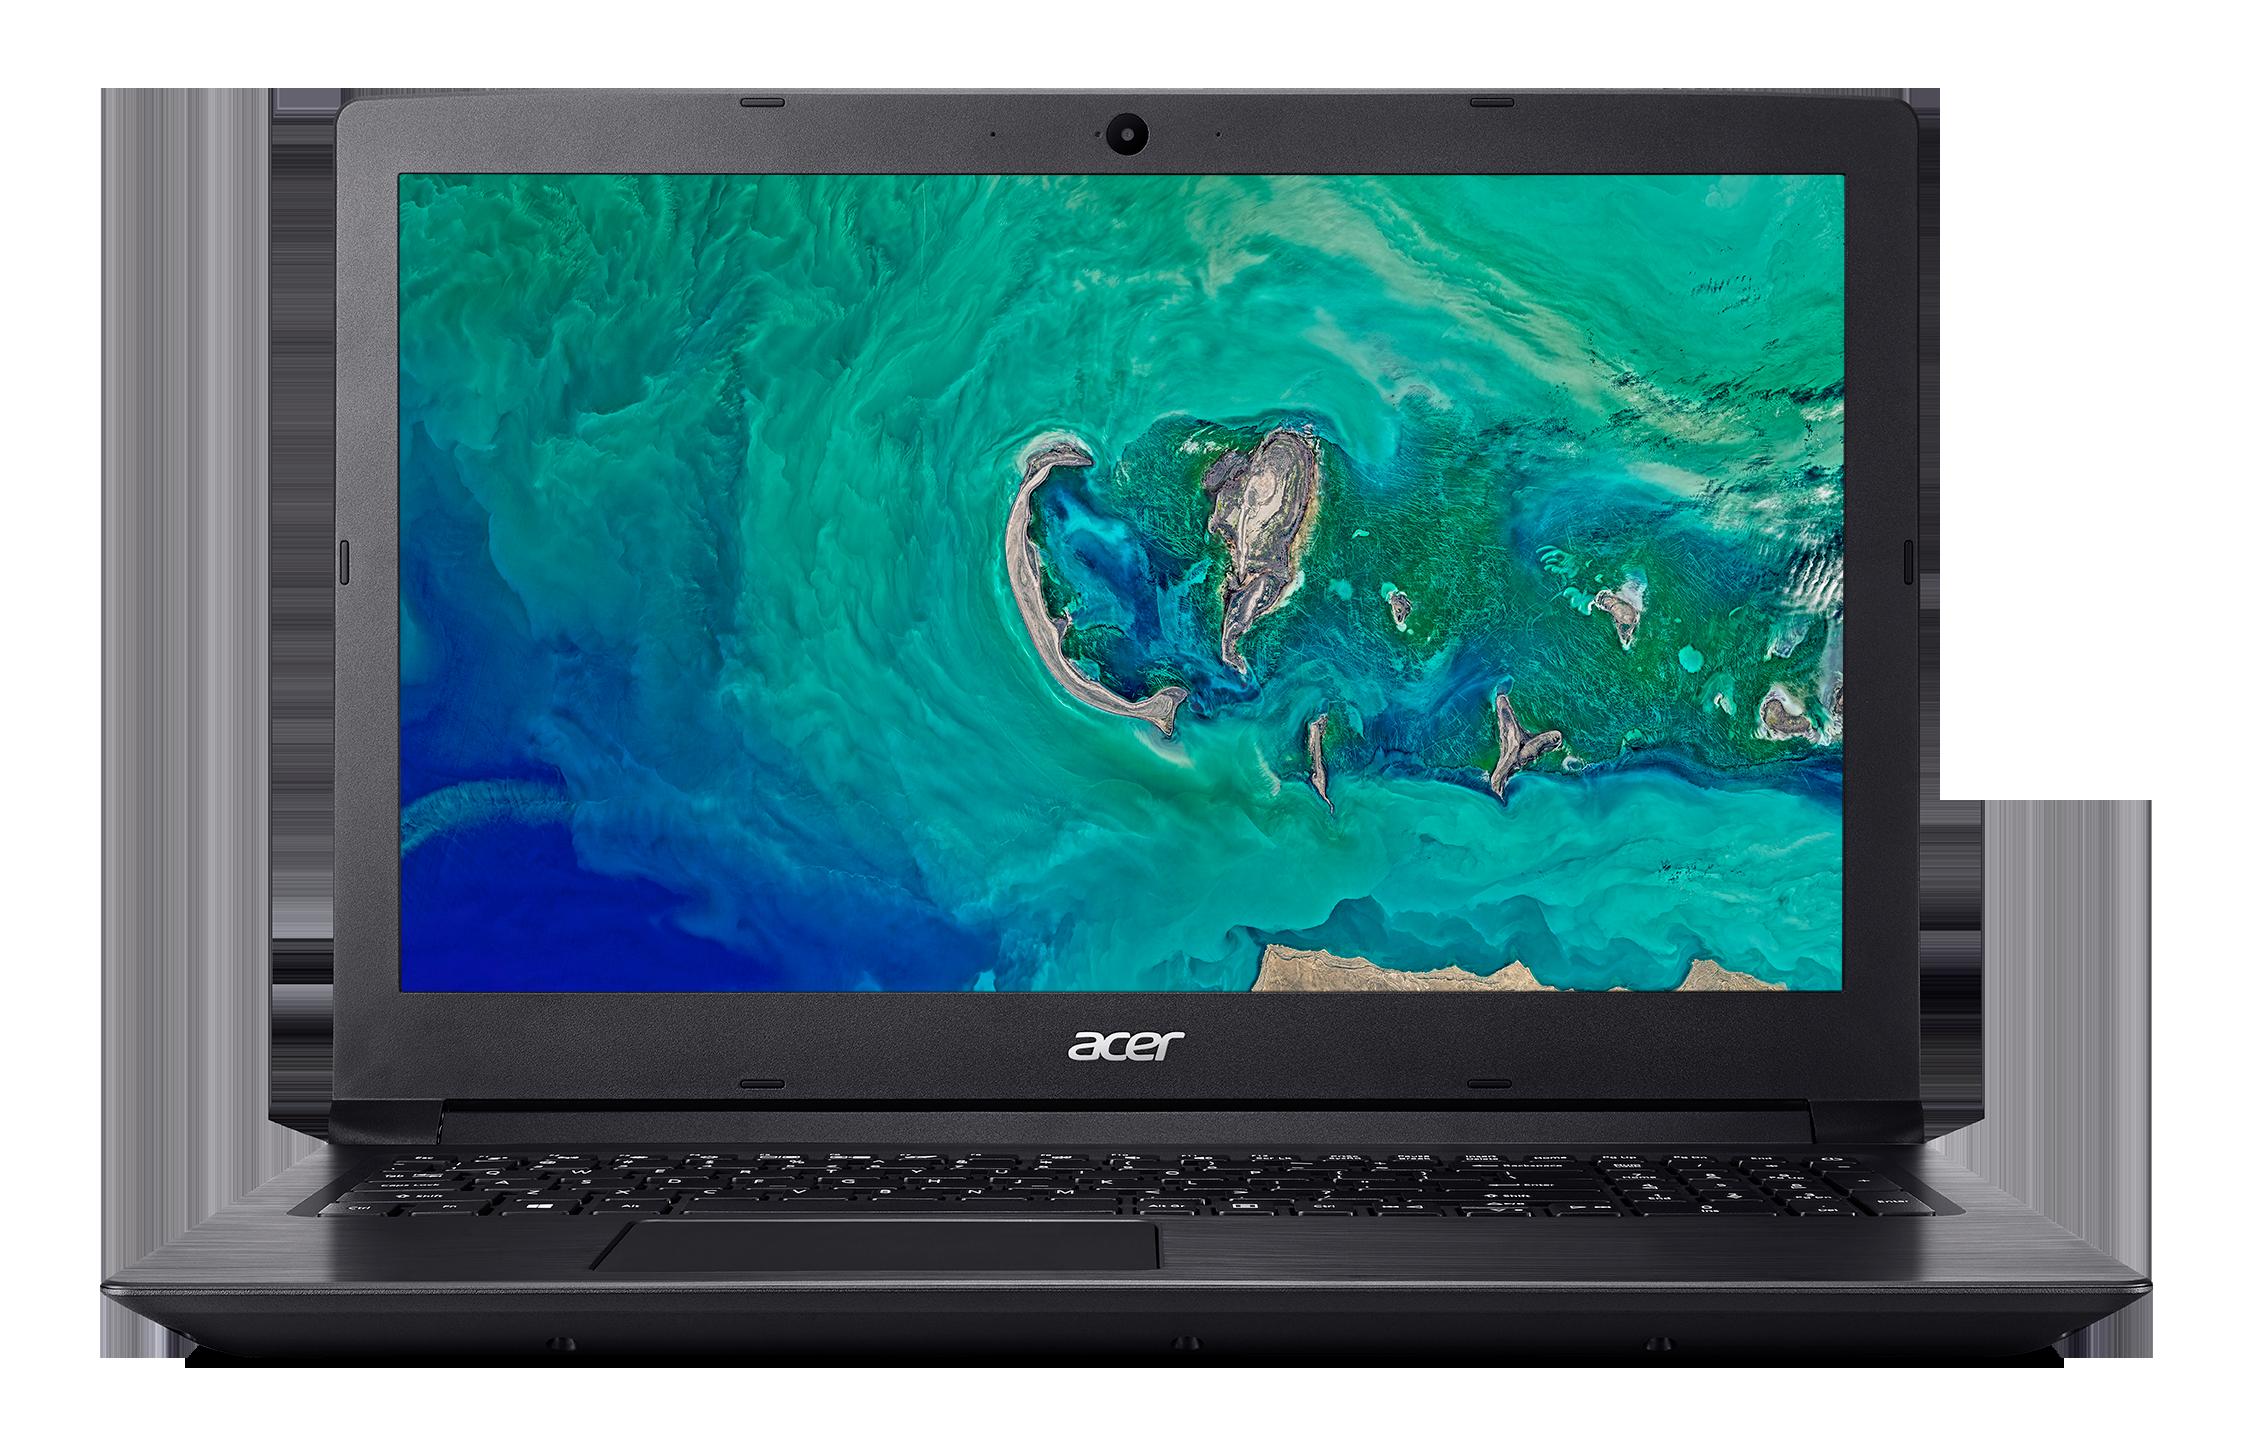 Acer Aspire 3 A315-53-39L5